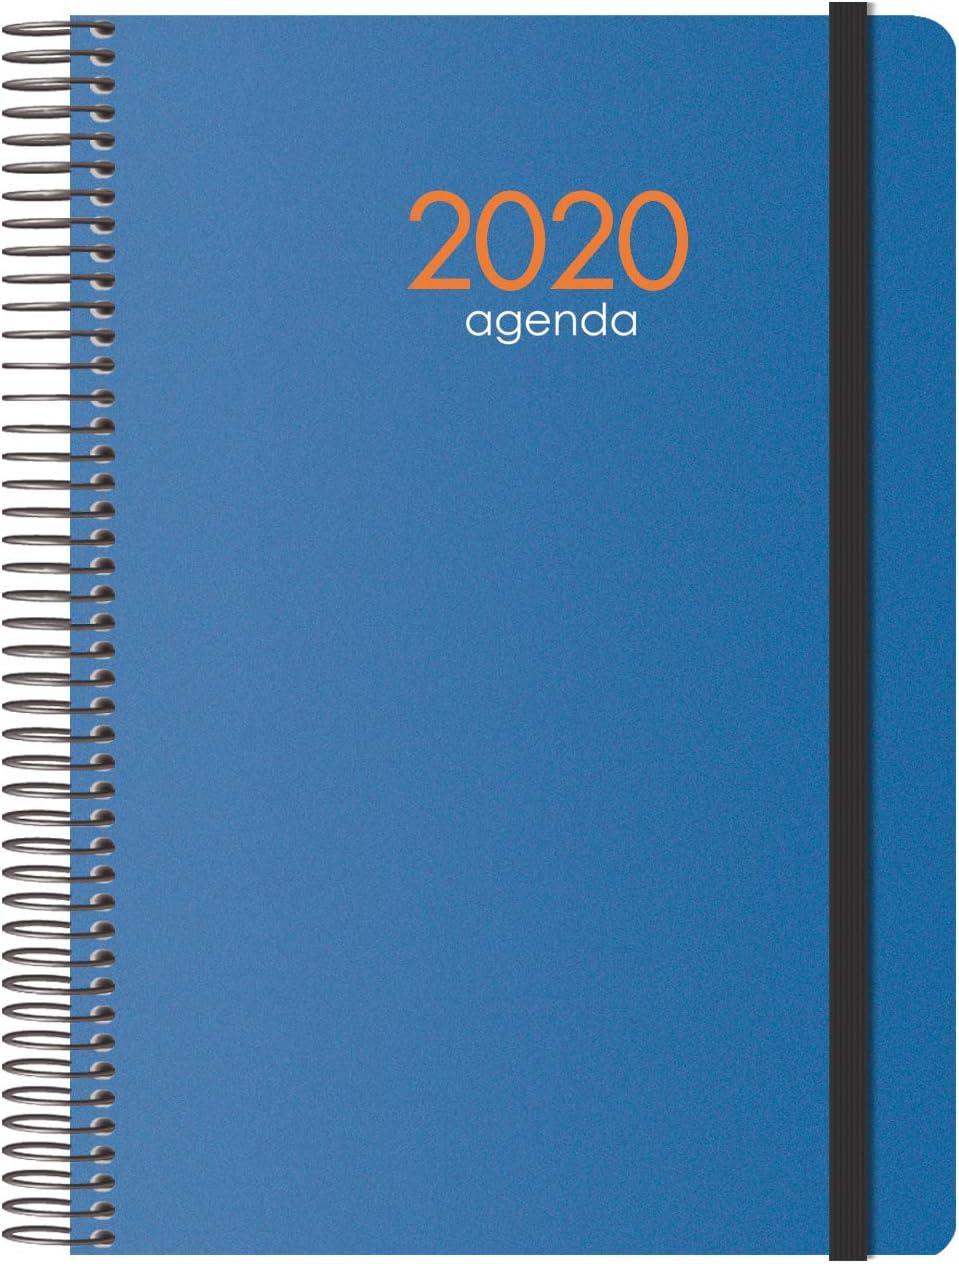 Dohe 11630 - Agenda, color azul